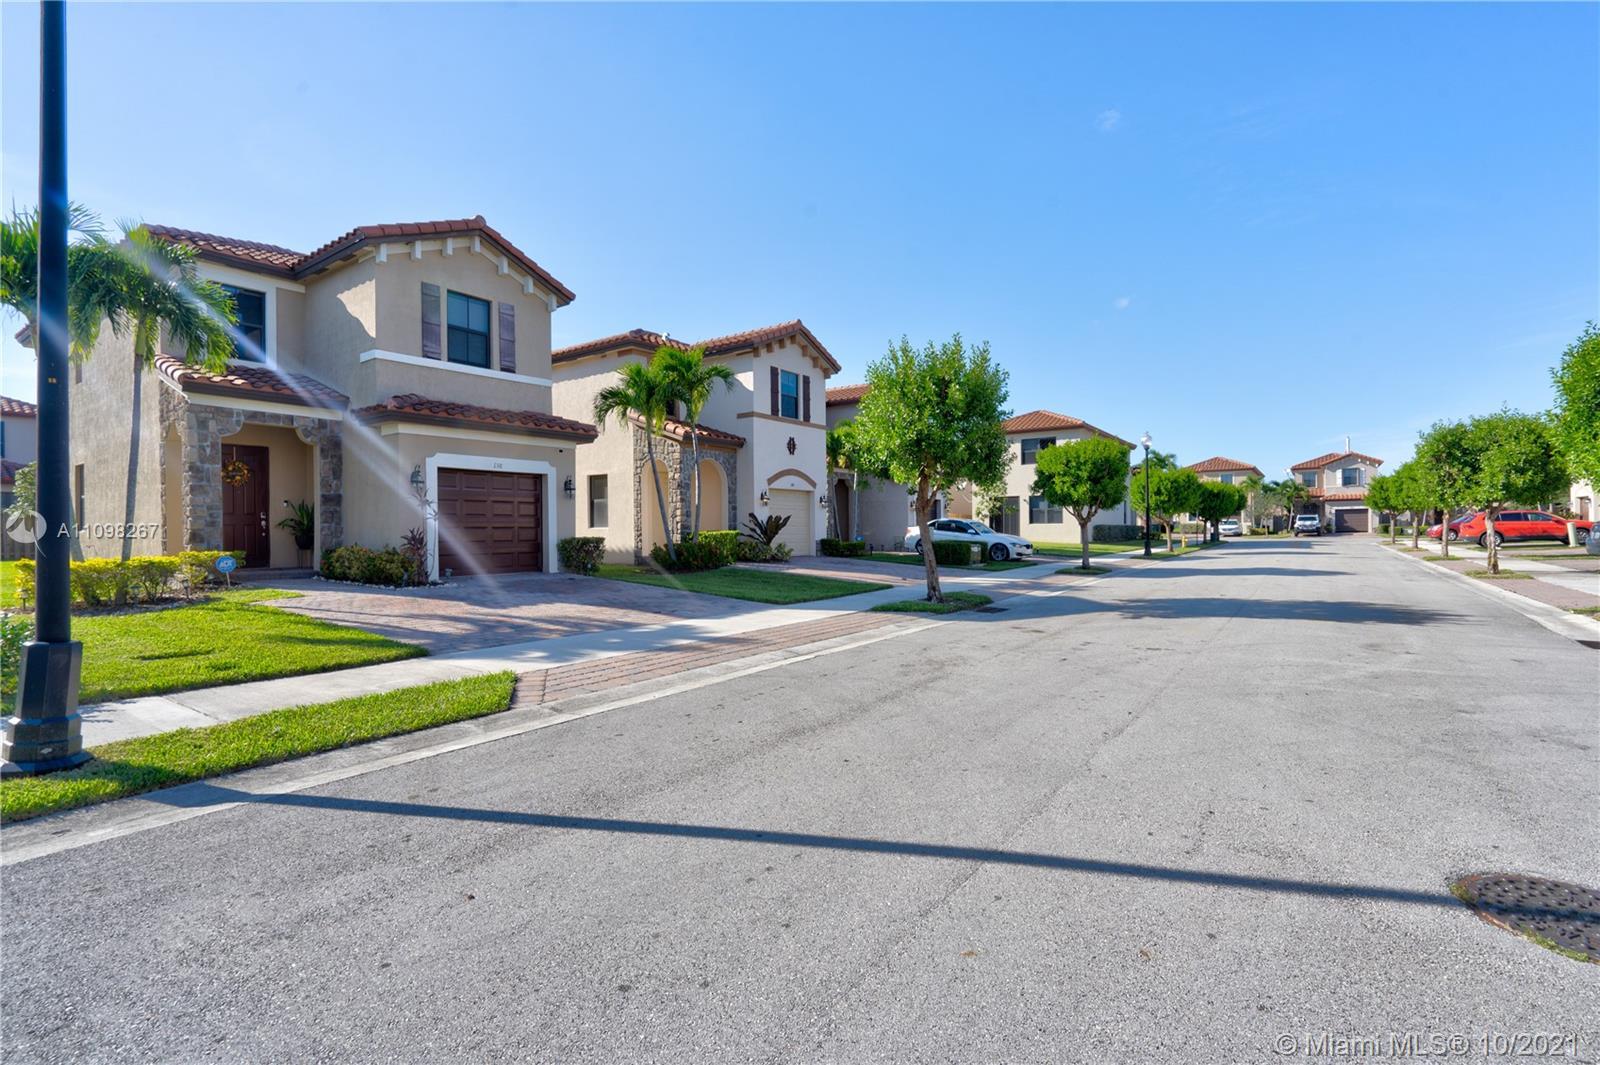 Single Family Home,For Sale,146 NE 37th Pl, Homestead, Florida 33033,Brickell,realty,broker,condos near me